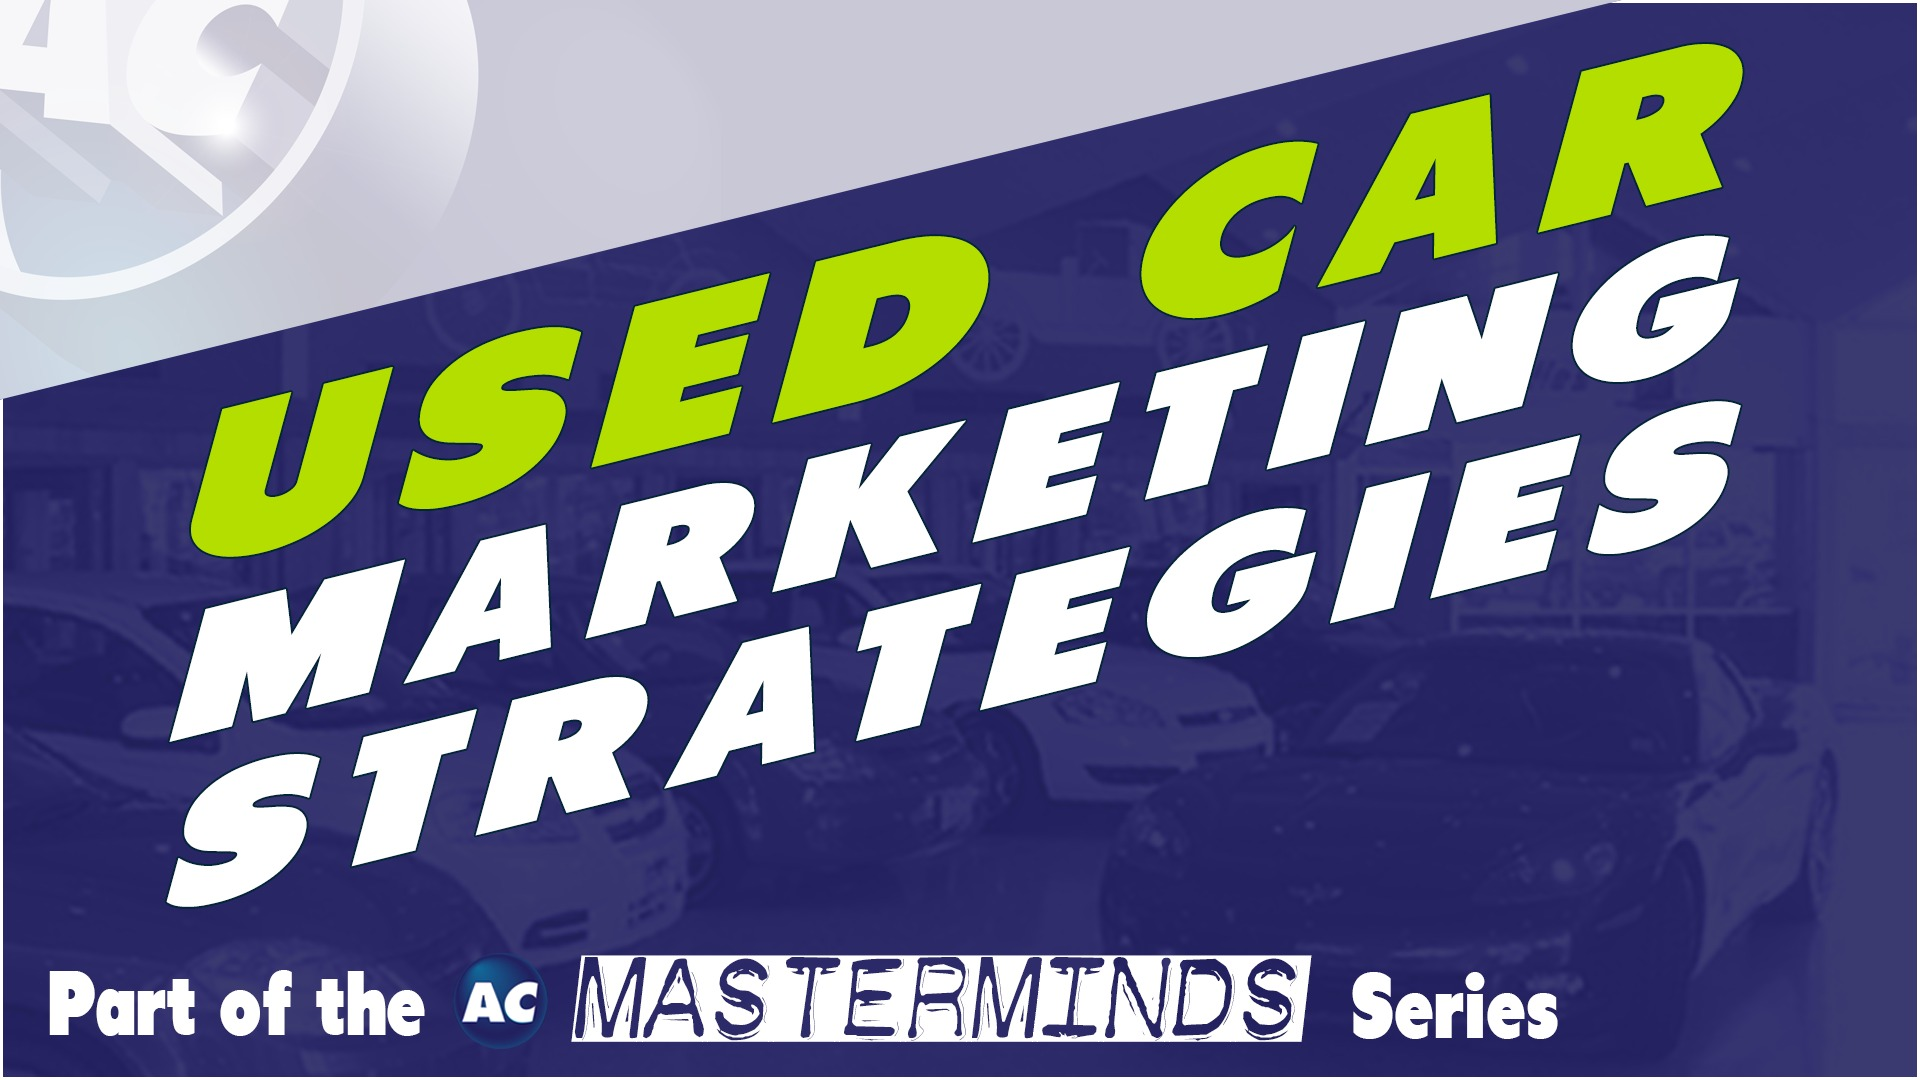 Used Car Marketing Strategies